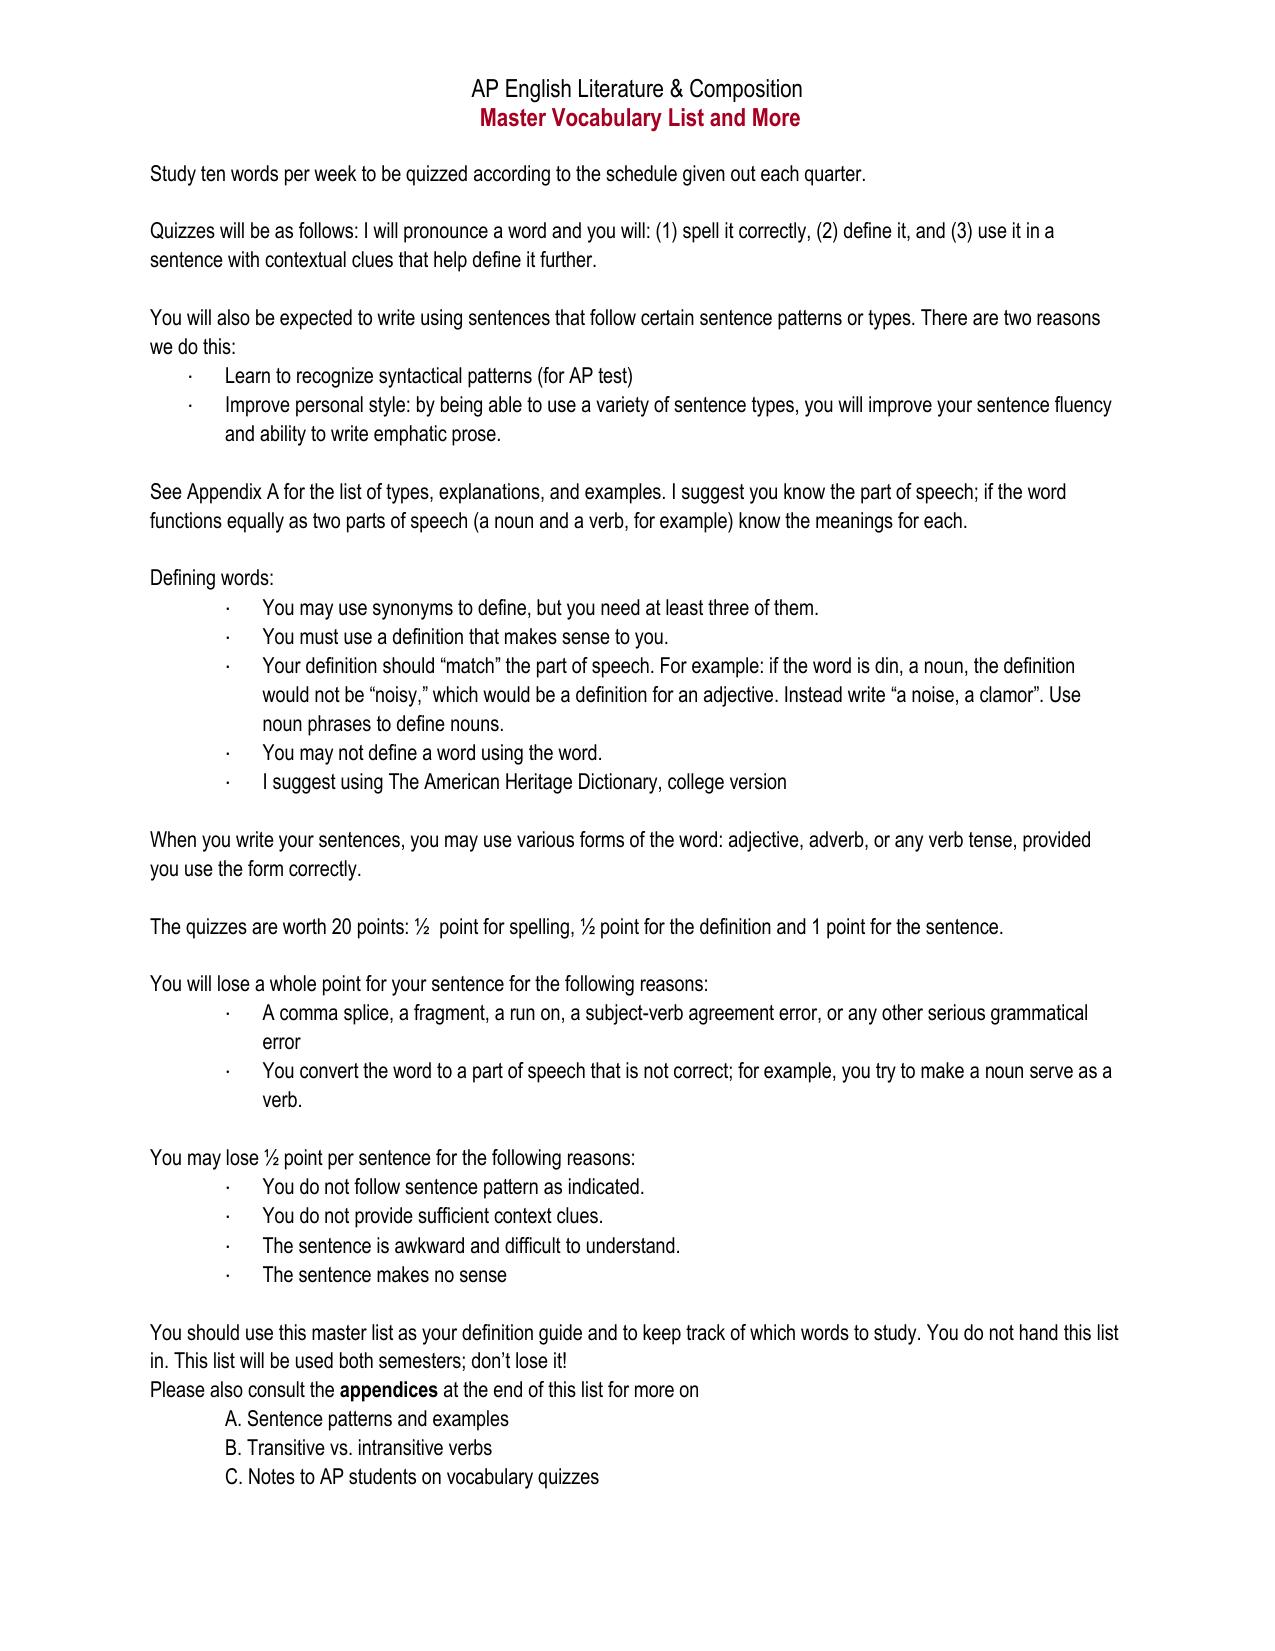 Vocabulary Packet (2016-2017)